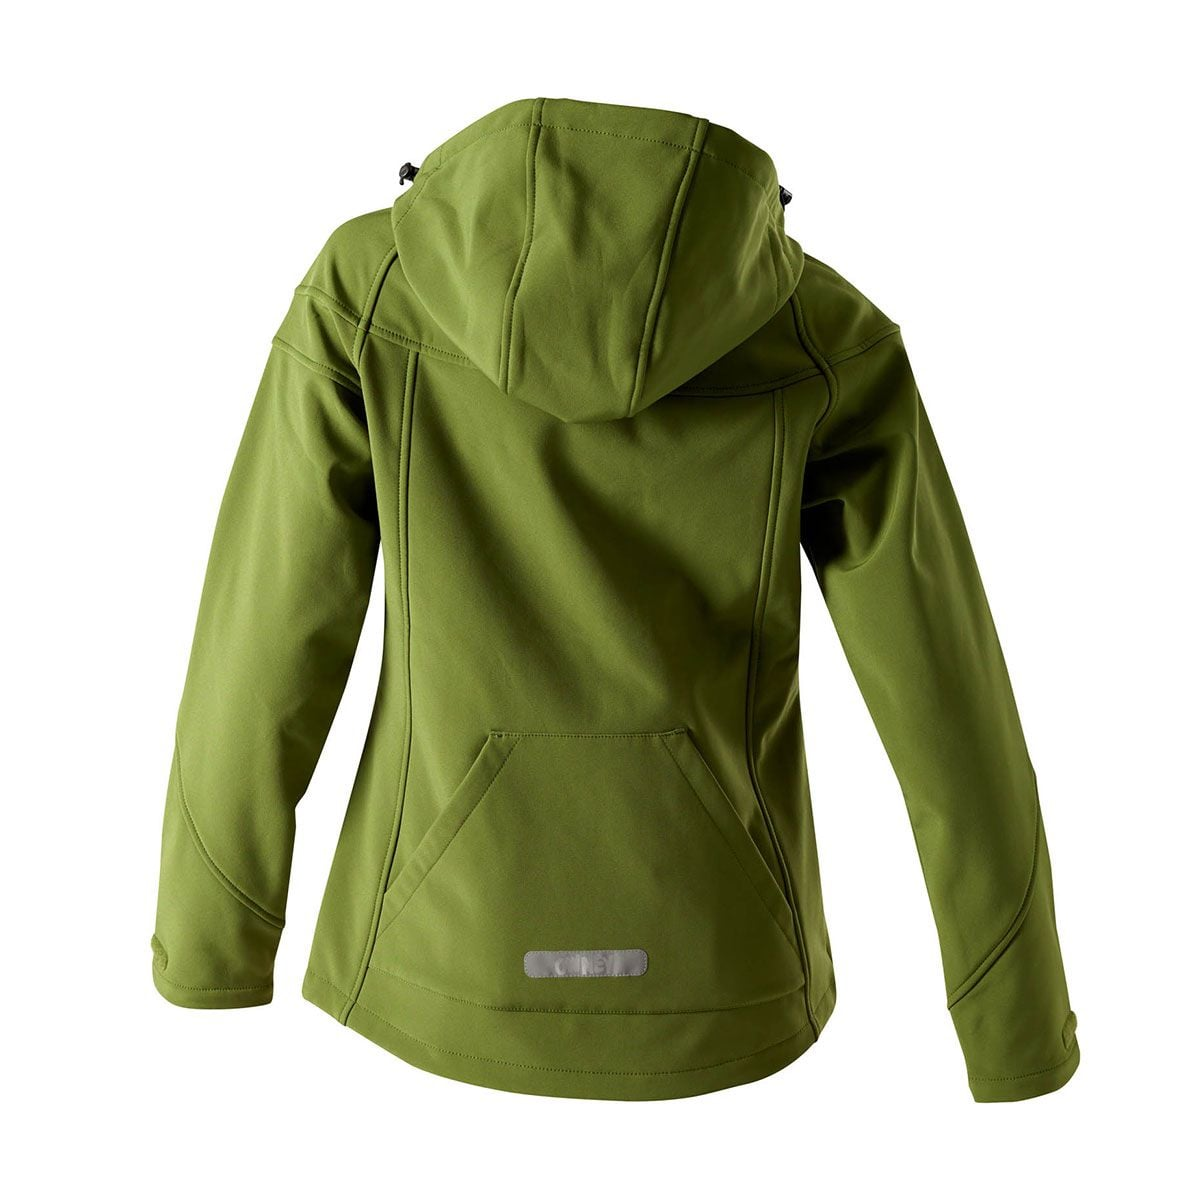 15e6a4e3bd7b2d Owney Cerro Damen Softshell Jacke cedar green günstig kaufen bei ...